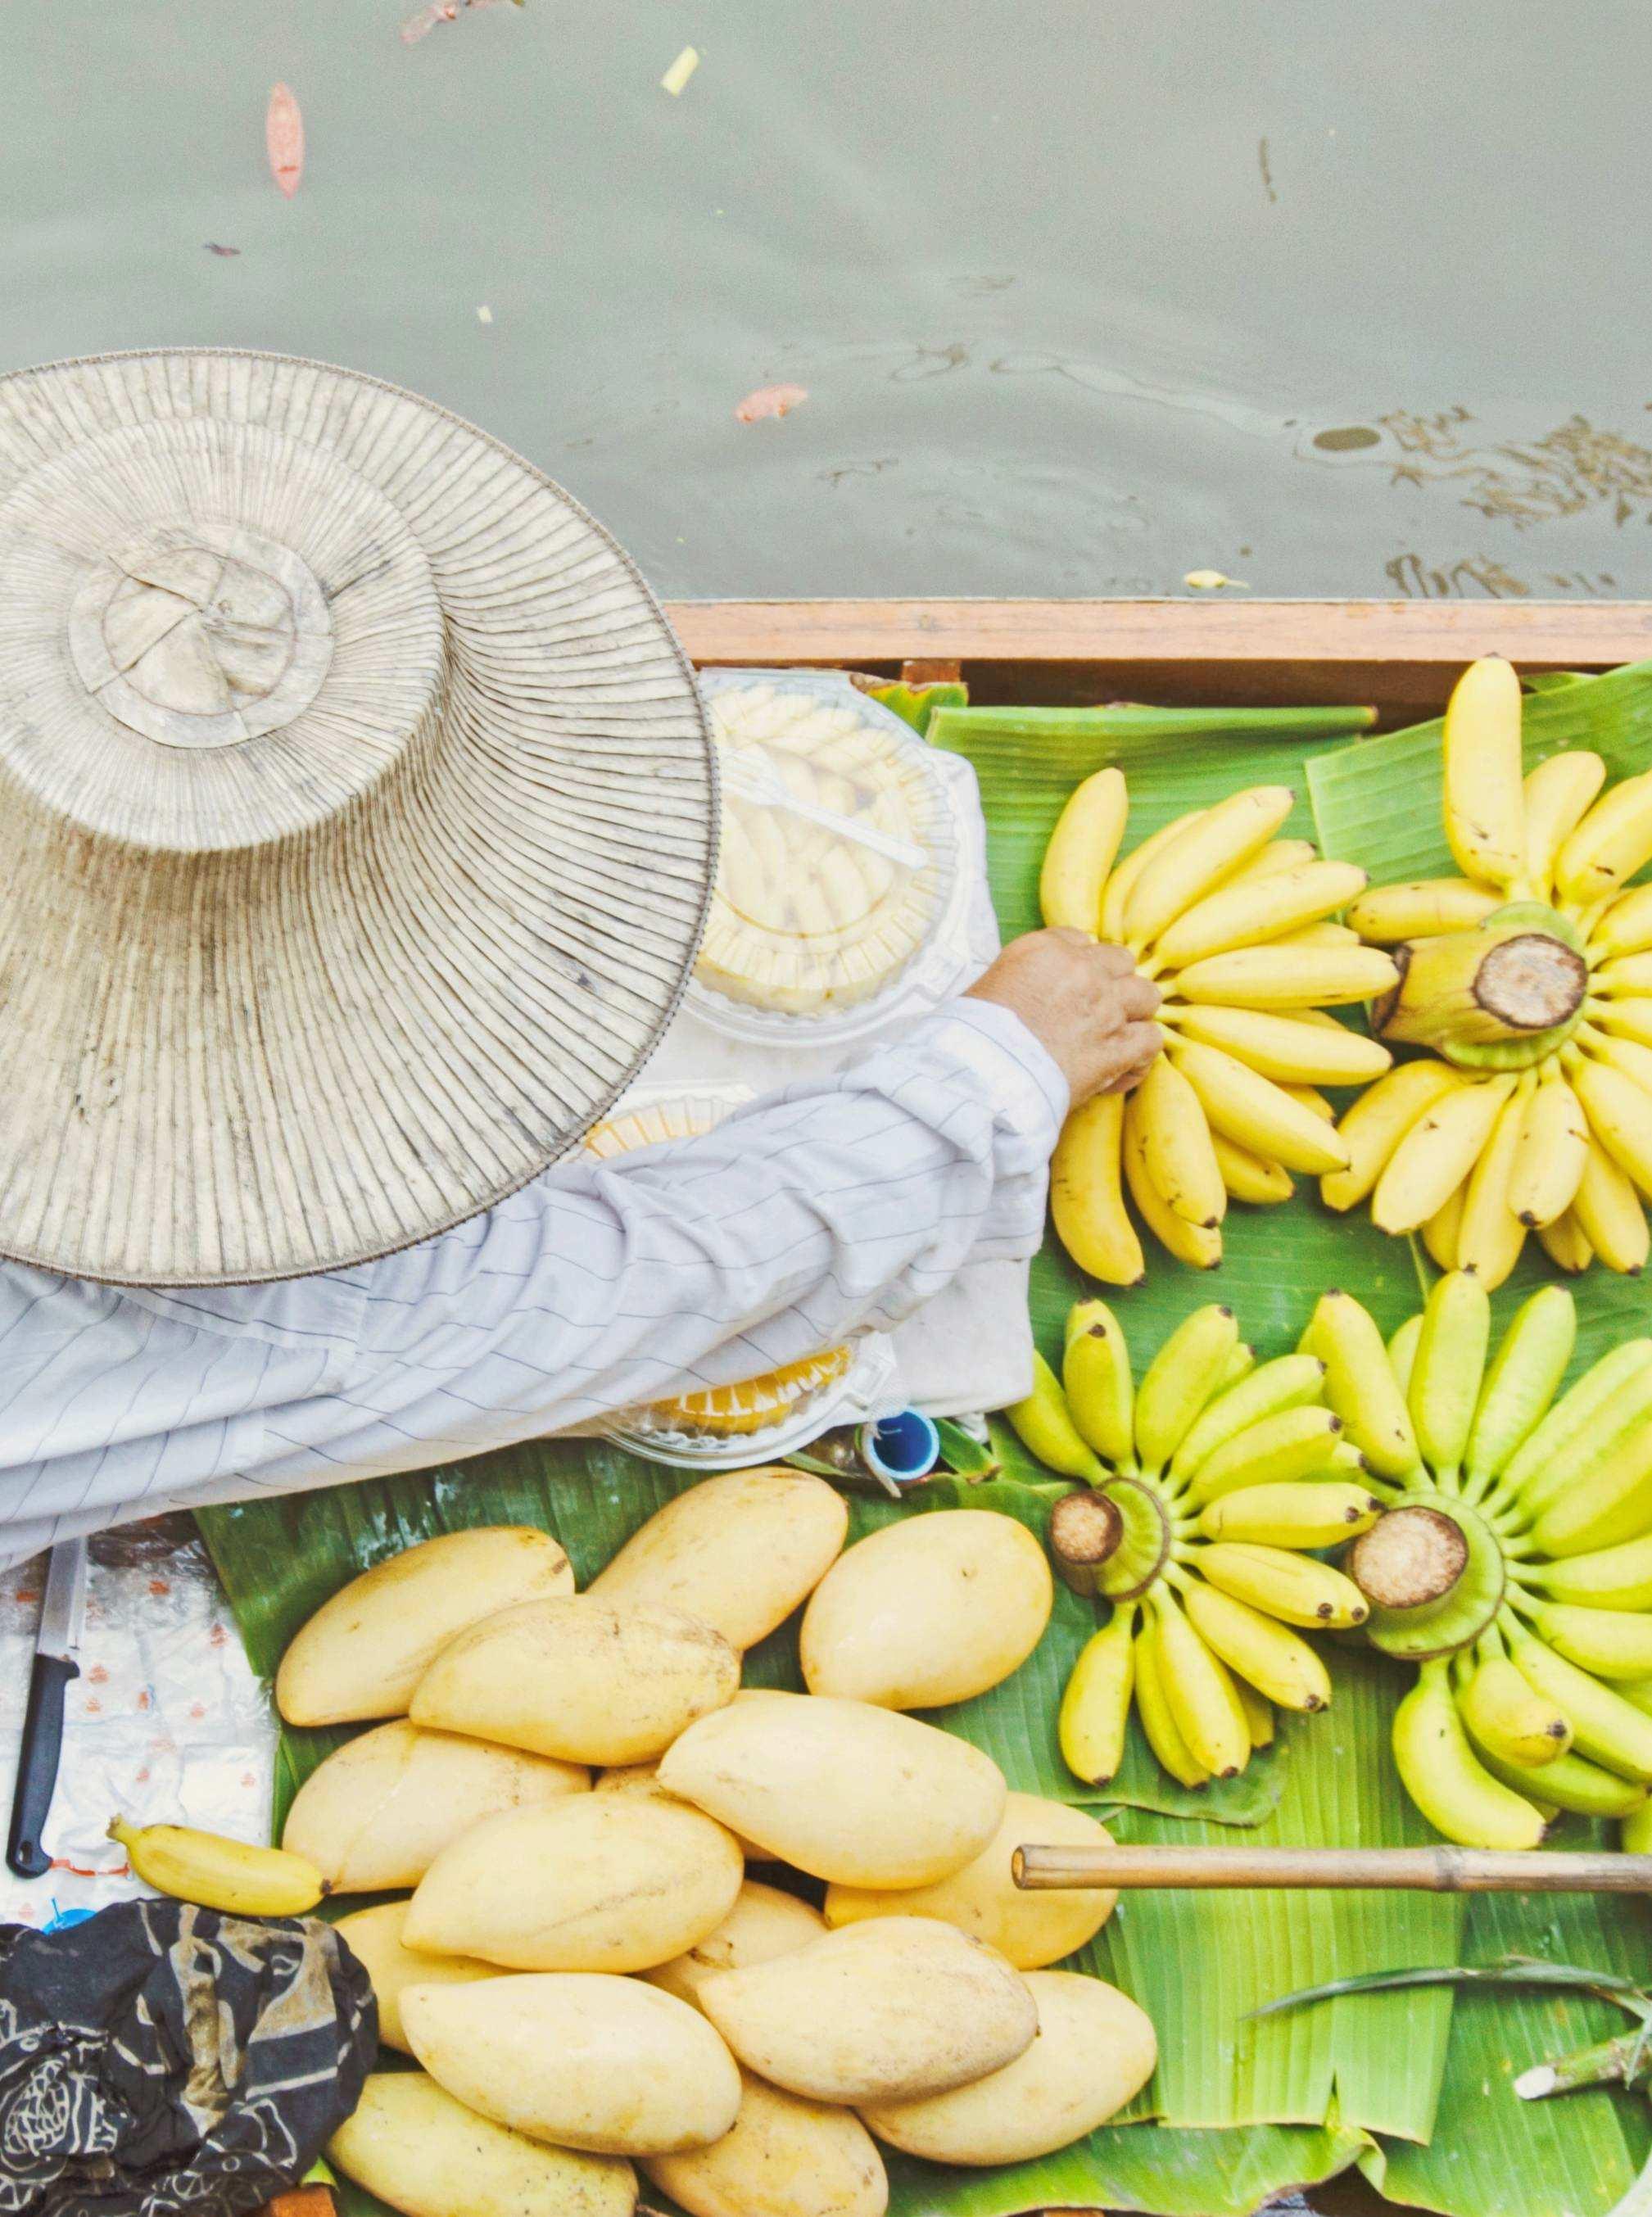 #EatTasteExplore the world: Γαστρονομικό ταξίδι στην Ταϊλάνδη!